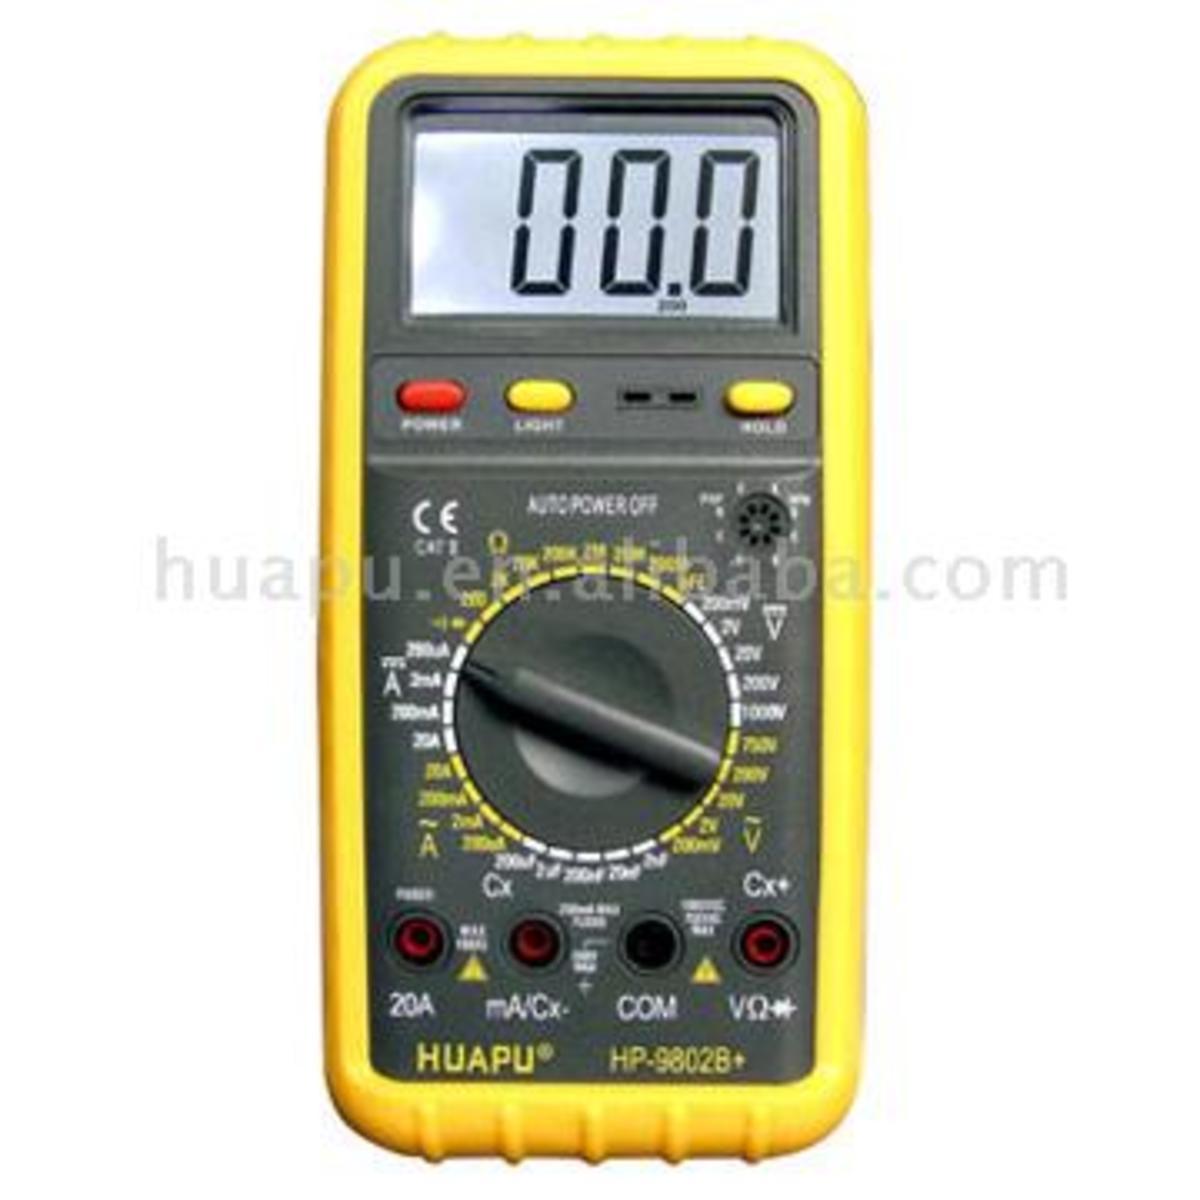 Digital multimeter, look for resistance settings or OHMS symbol